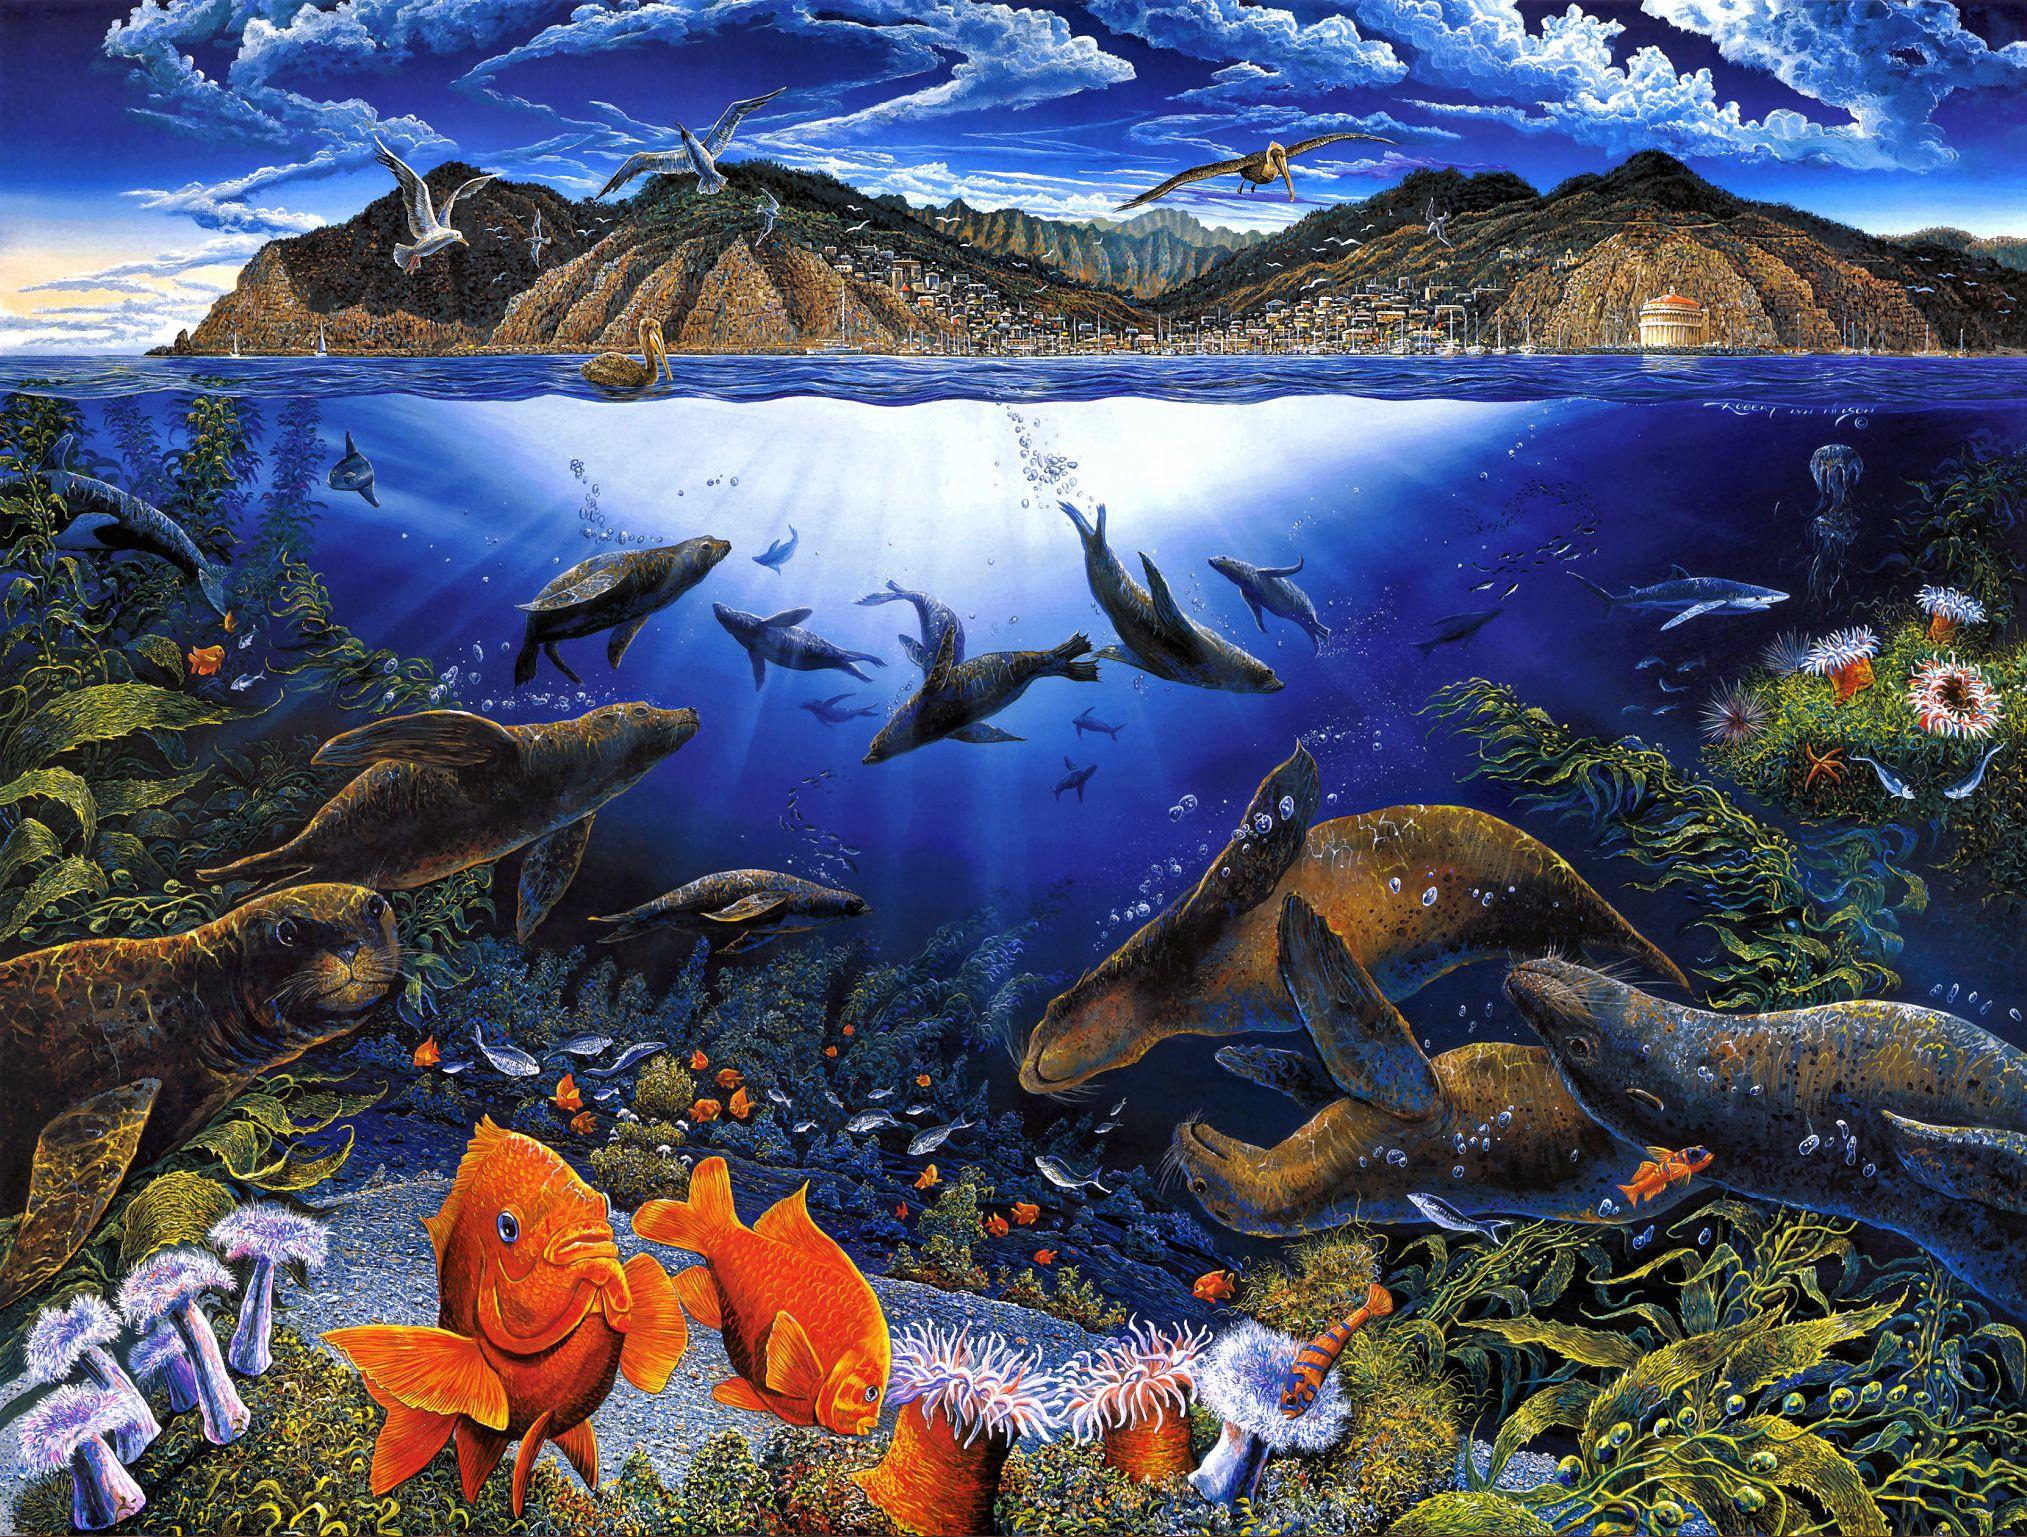 Animal   Sea Life Wallpaper 2027x1537